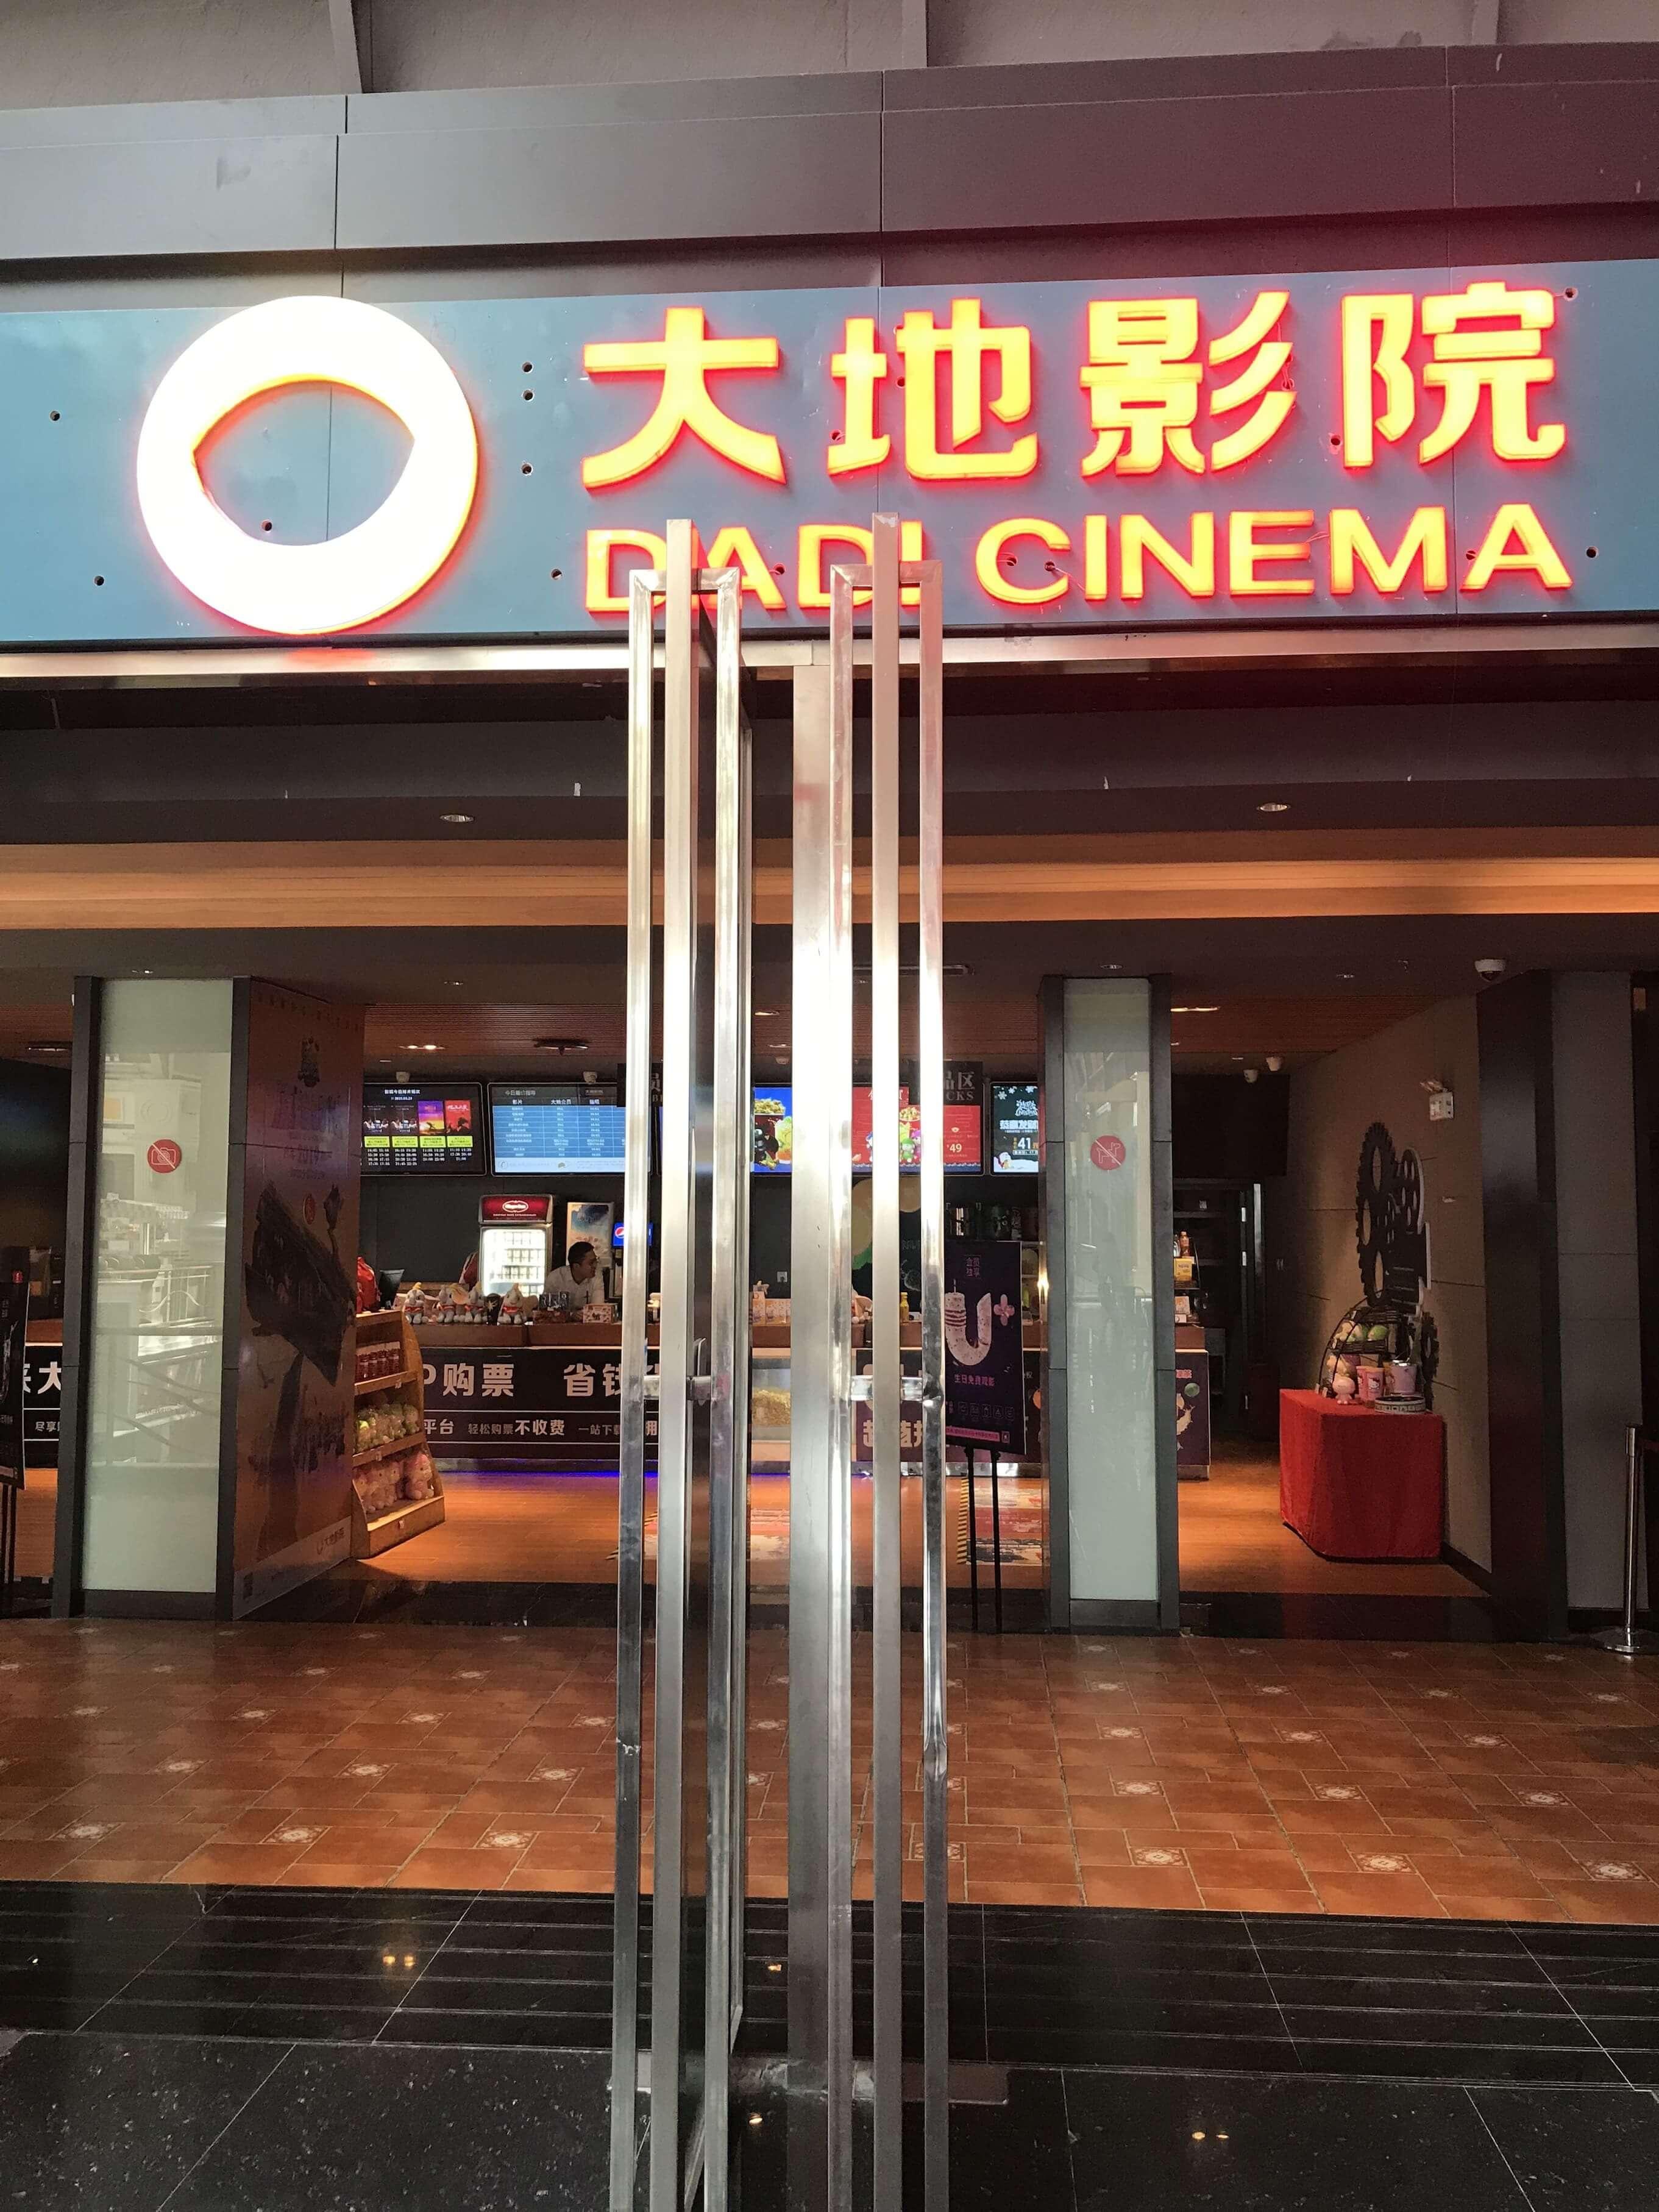 Dadi Cinema